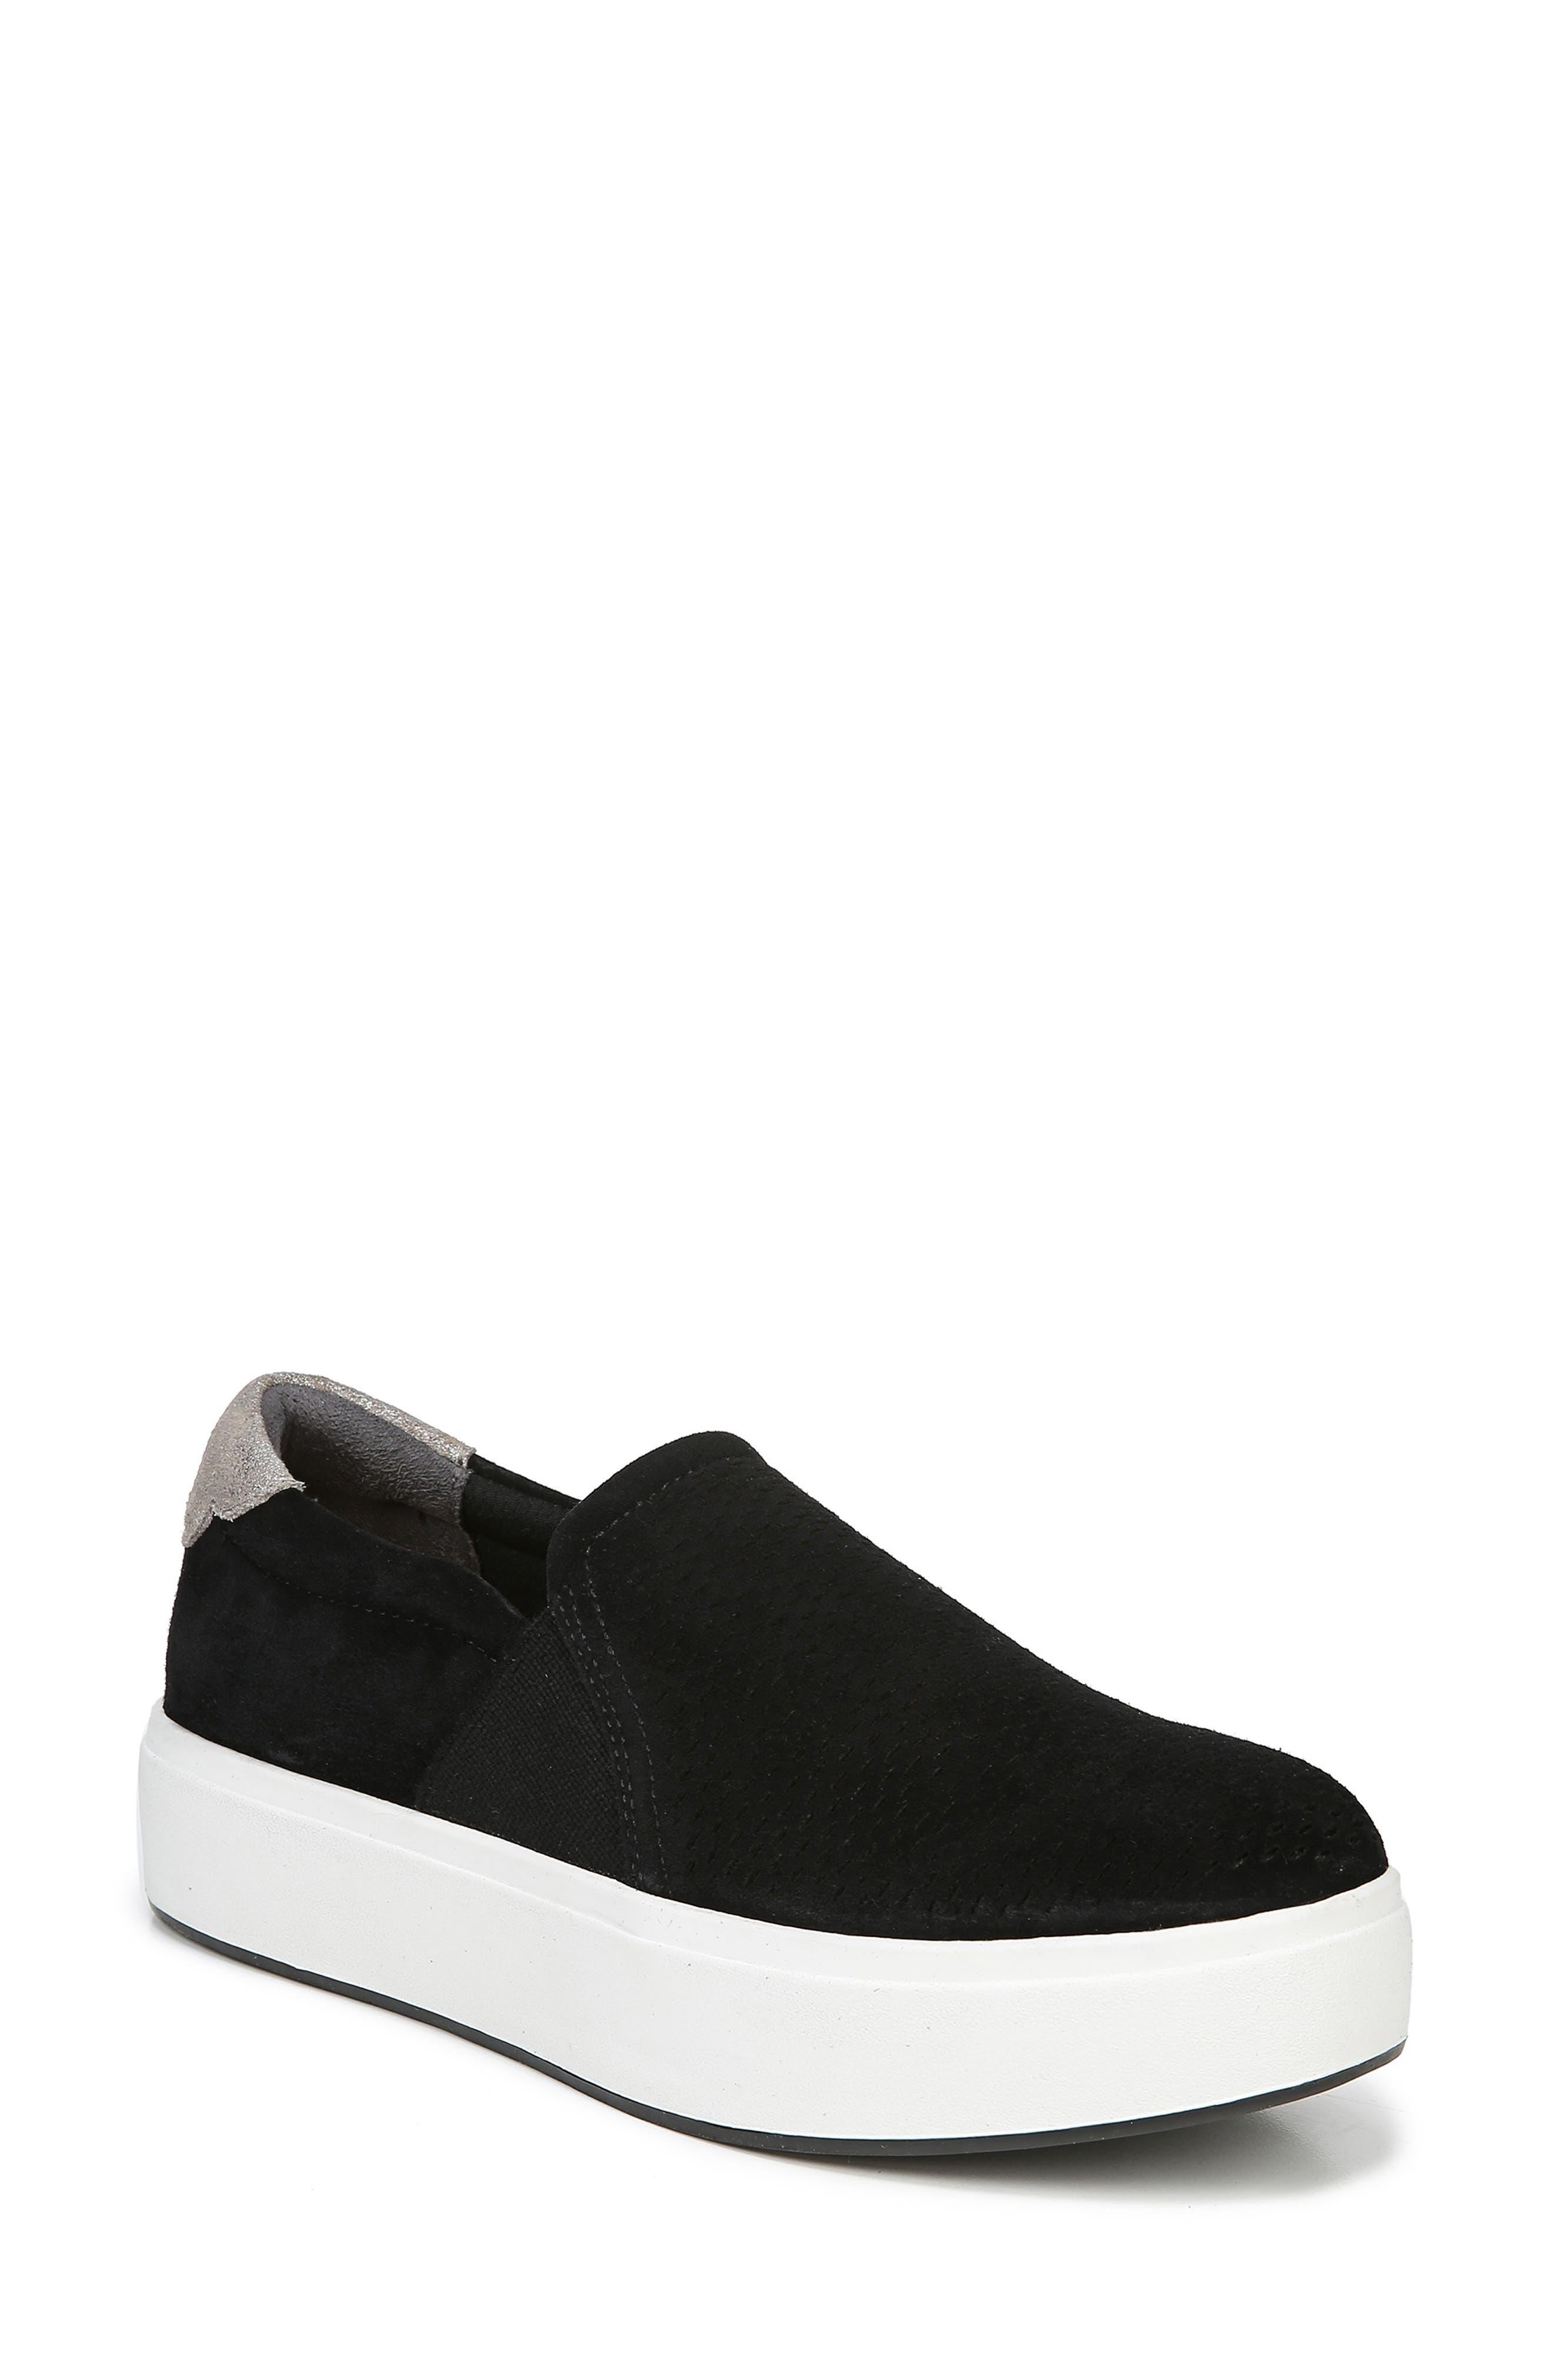 DR. SCHOLL'S Abbot Lux Sneaker, Main, color, BLACK SUEDE